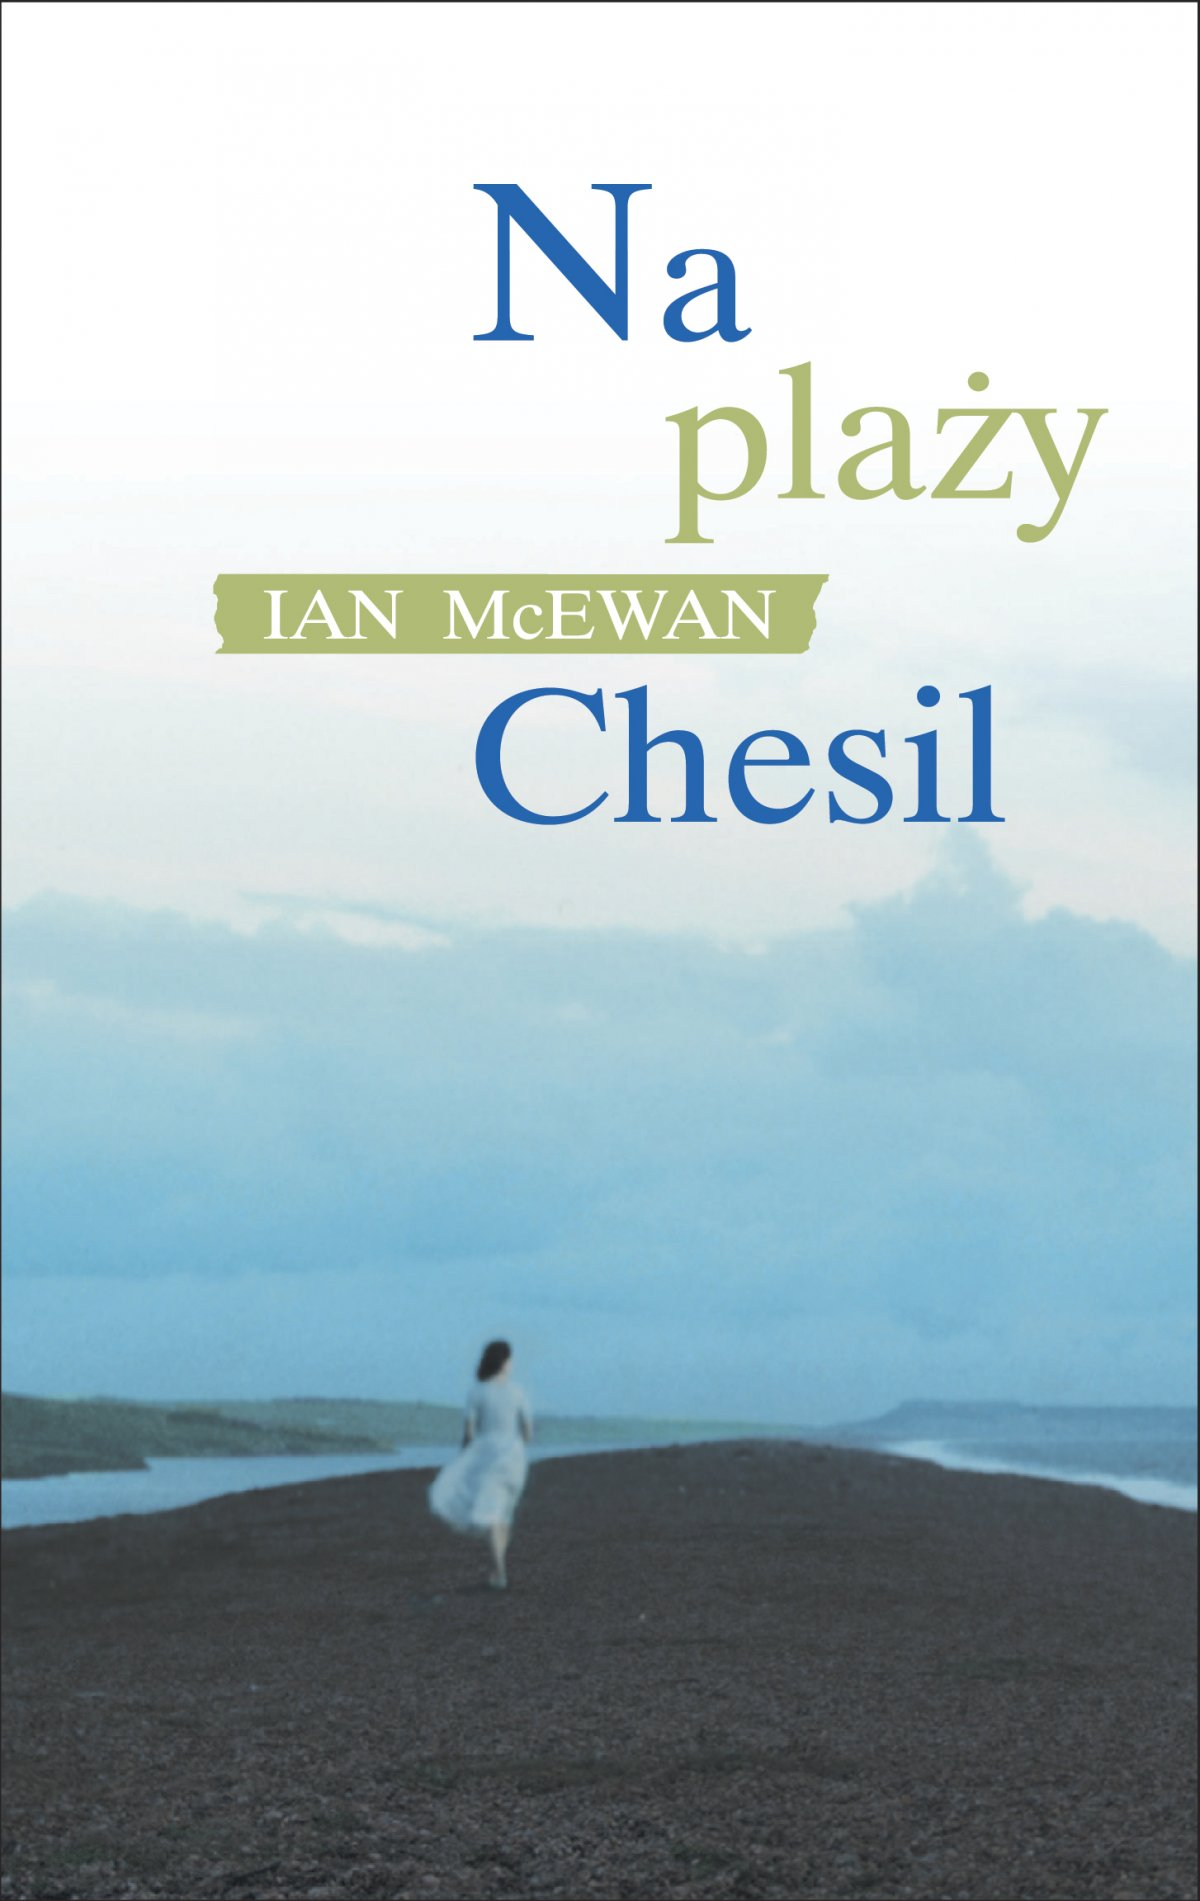 Na plaży Chesil - Ebook (Książka na Kindle) do pobrania w formacie MOBI